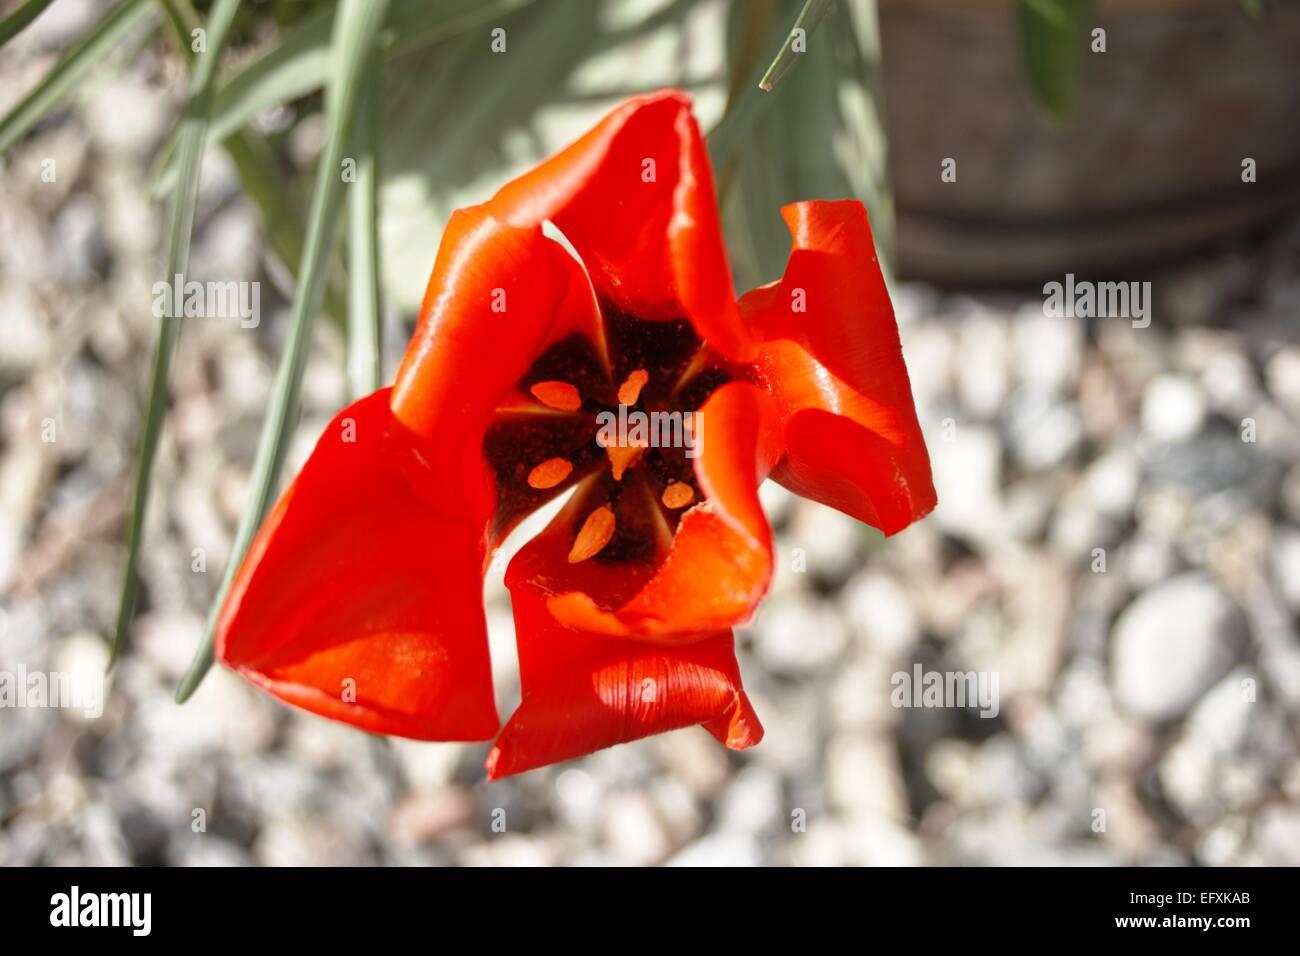 Warped Red Tulip - Stock Image